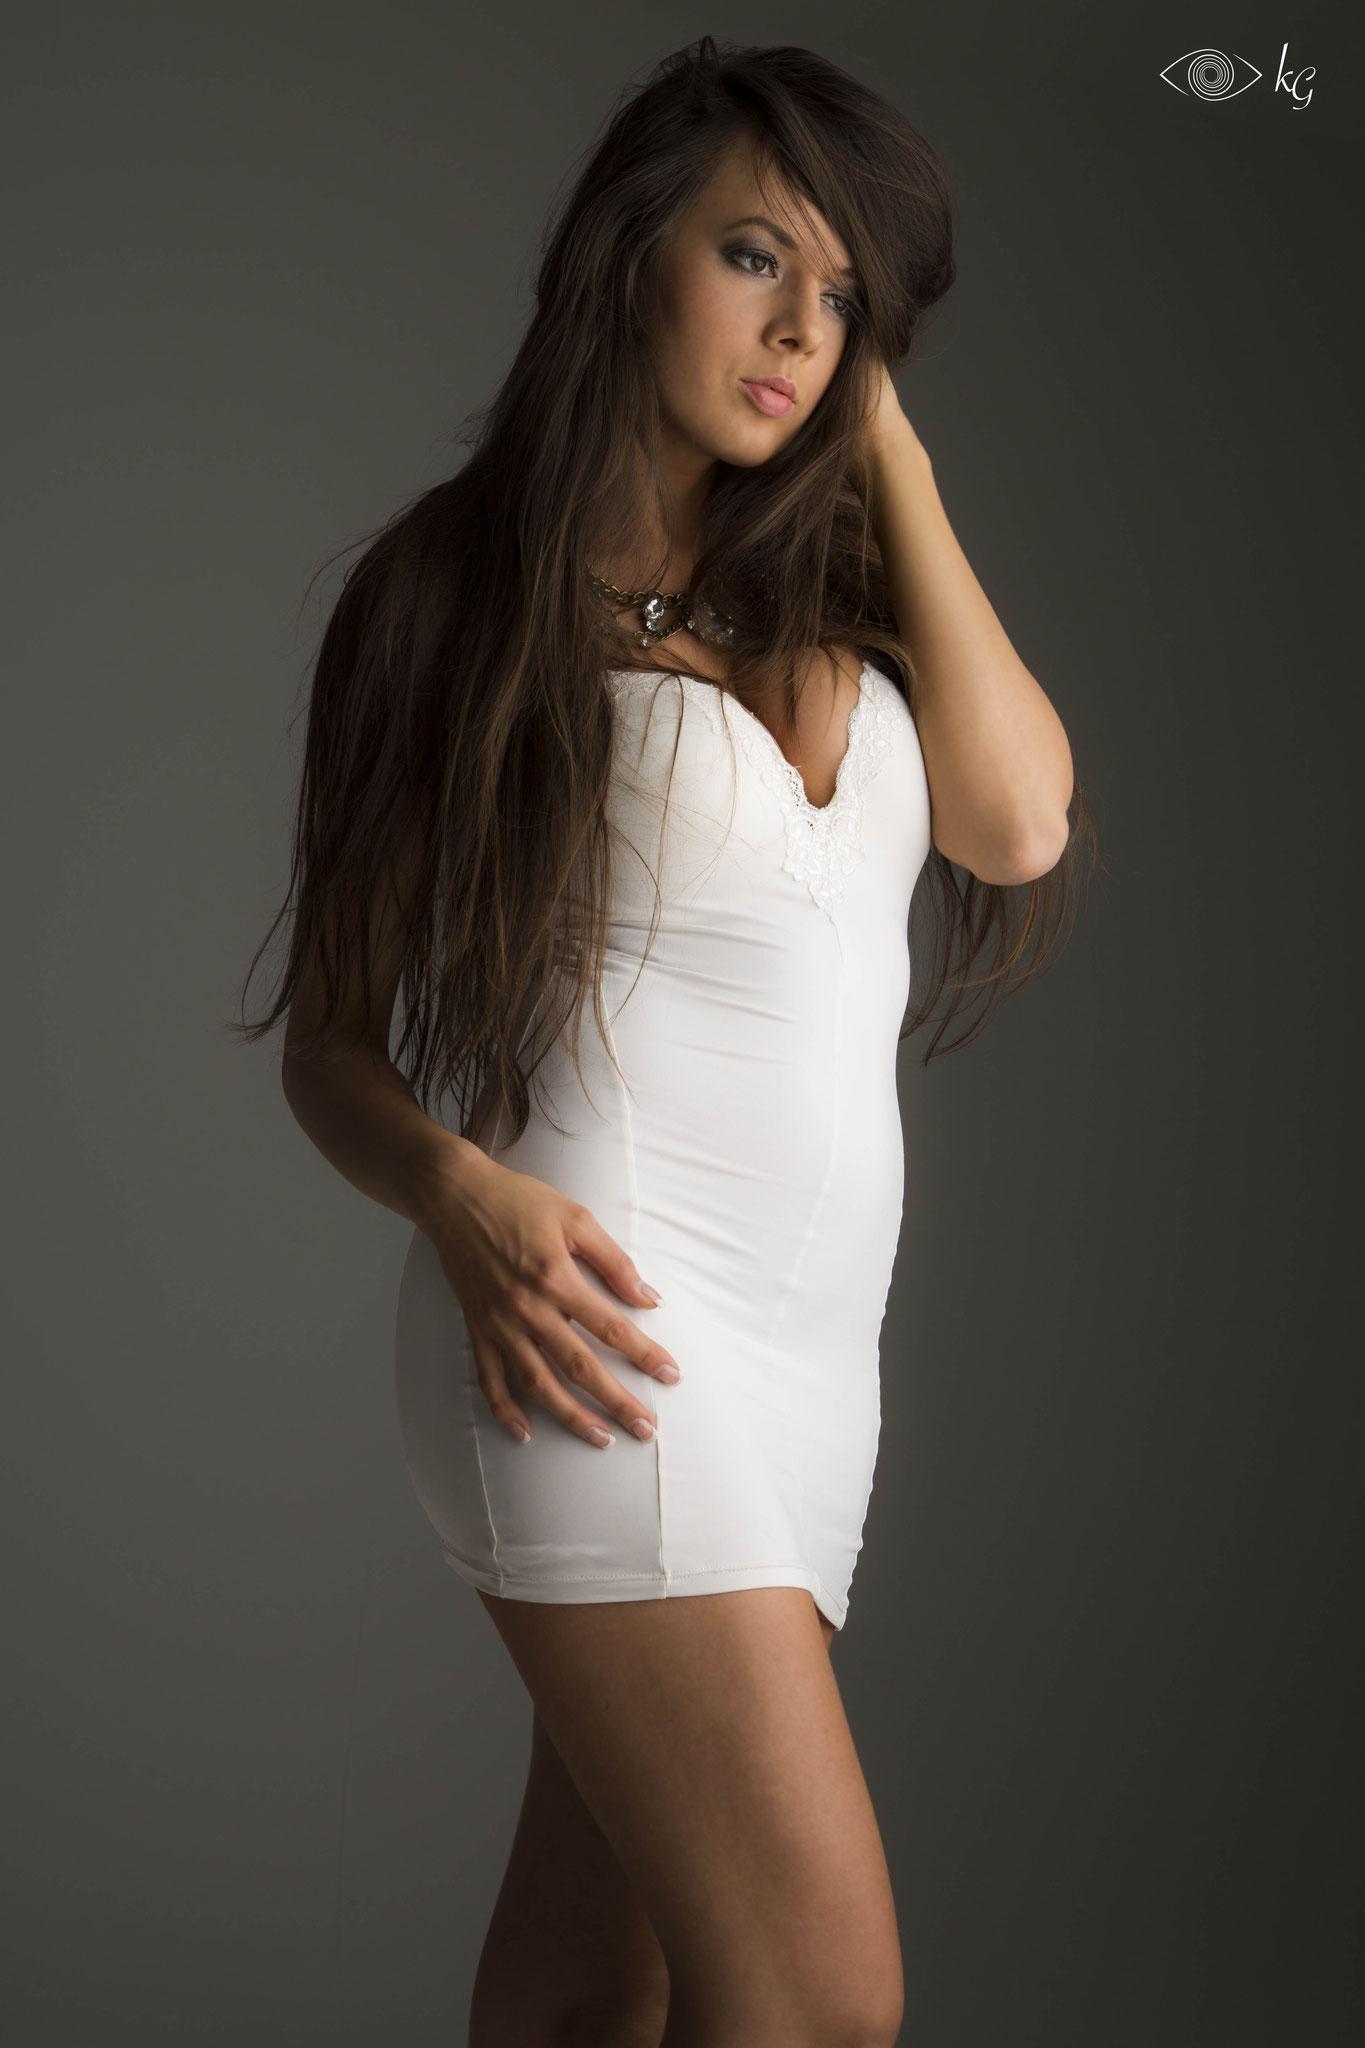 Nikola (professional Model)